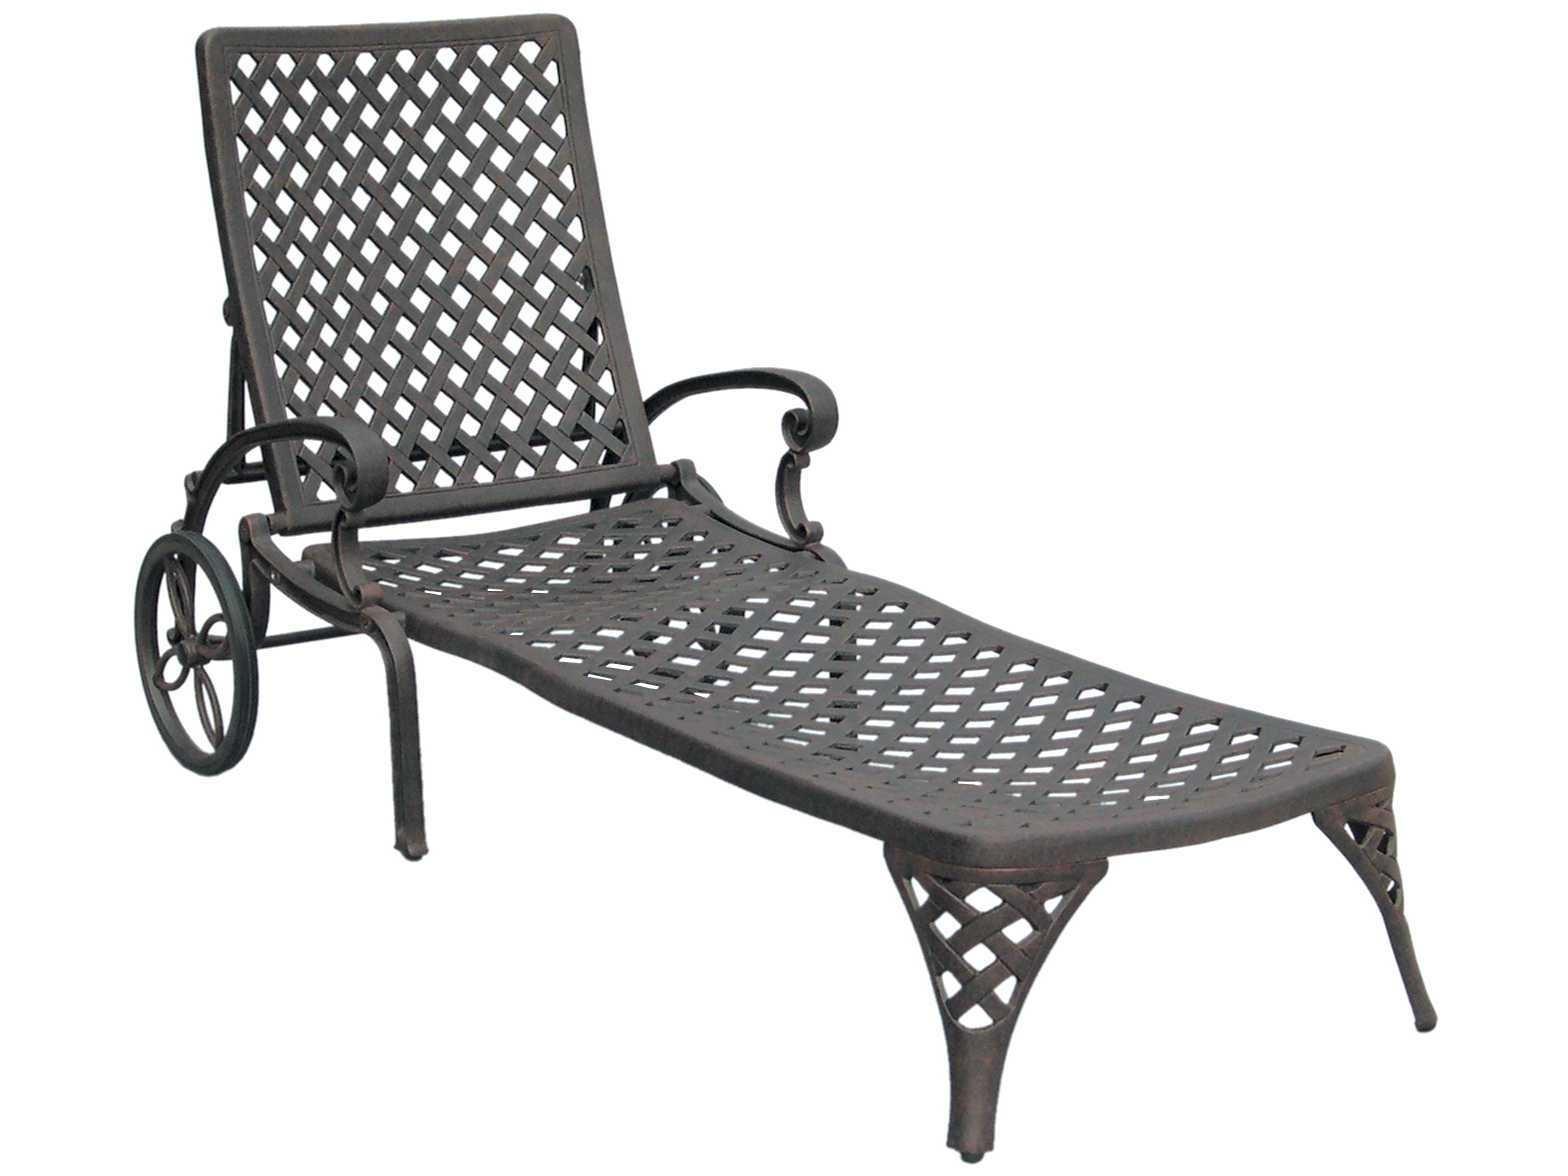 2017 Outdoor Cast Aluminum Chaise Lounge Chairs Regarding Darlee Outdoor Living Standard Nassau Cast Aluminum Antique Bronze (View 2 of 15)